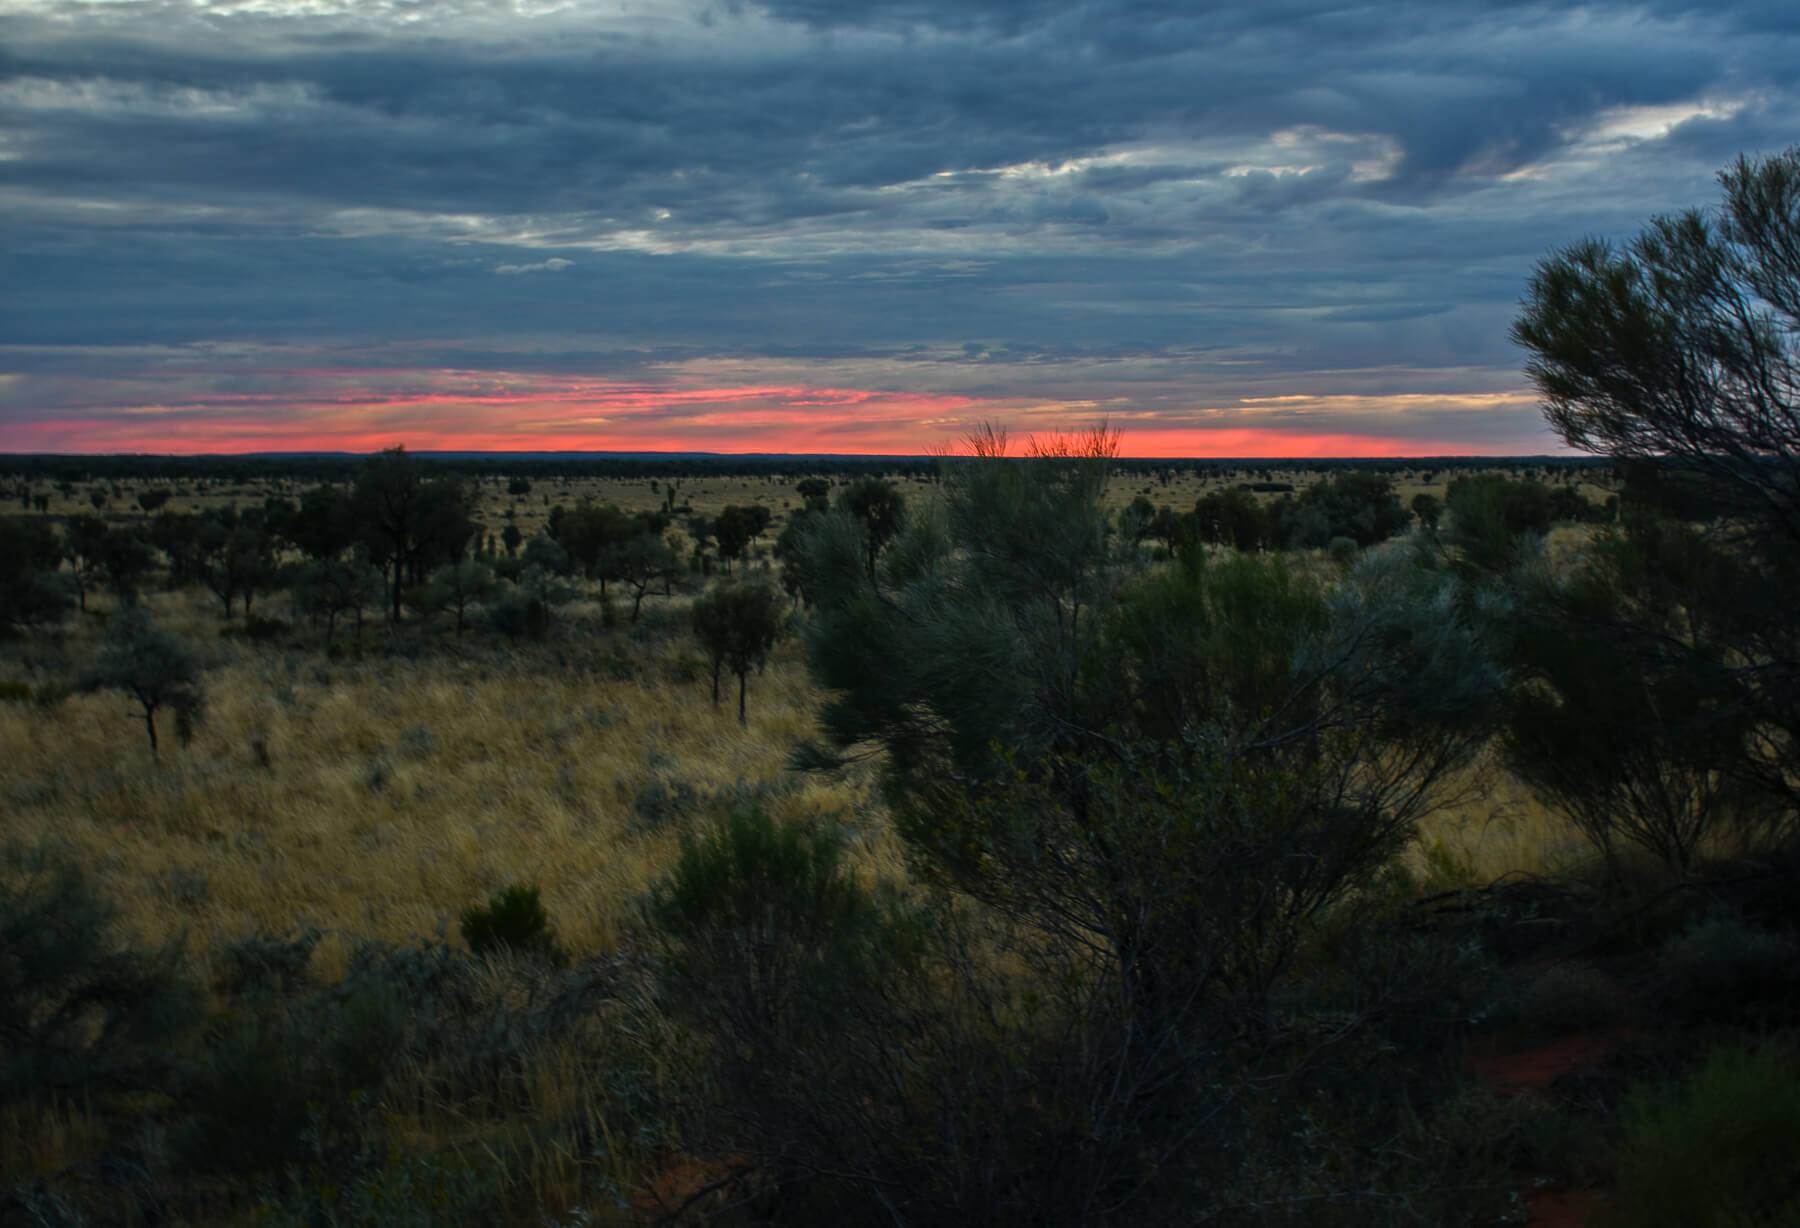 Sunrise over the Australian Outback